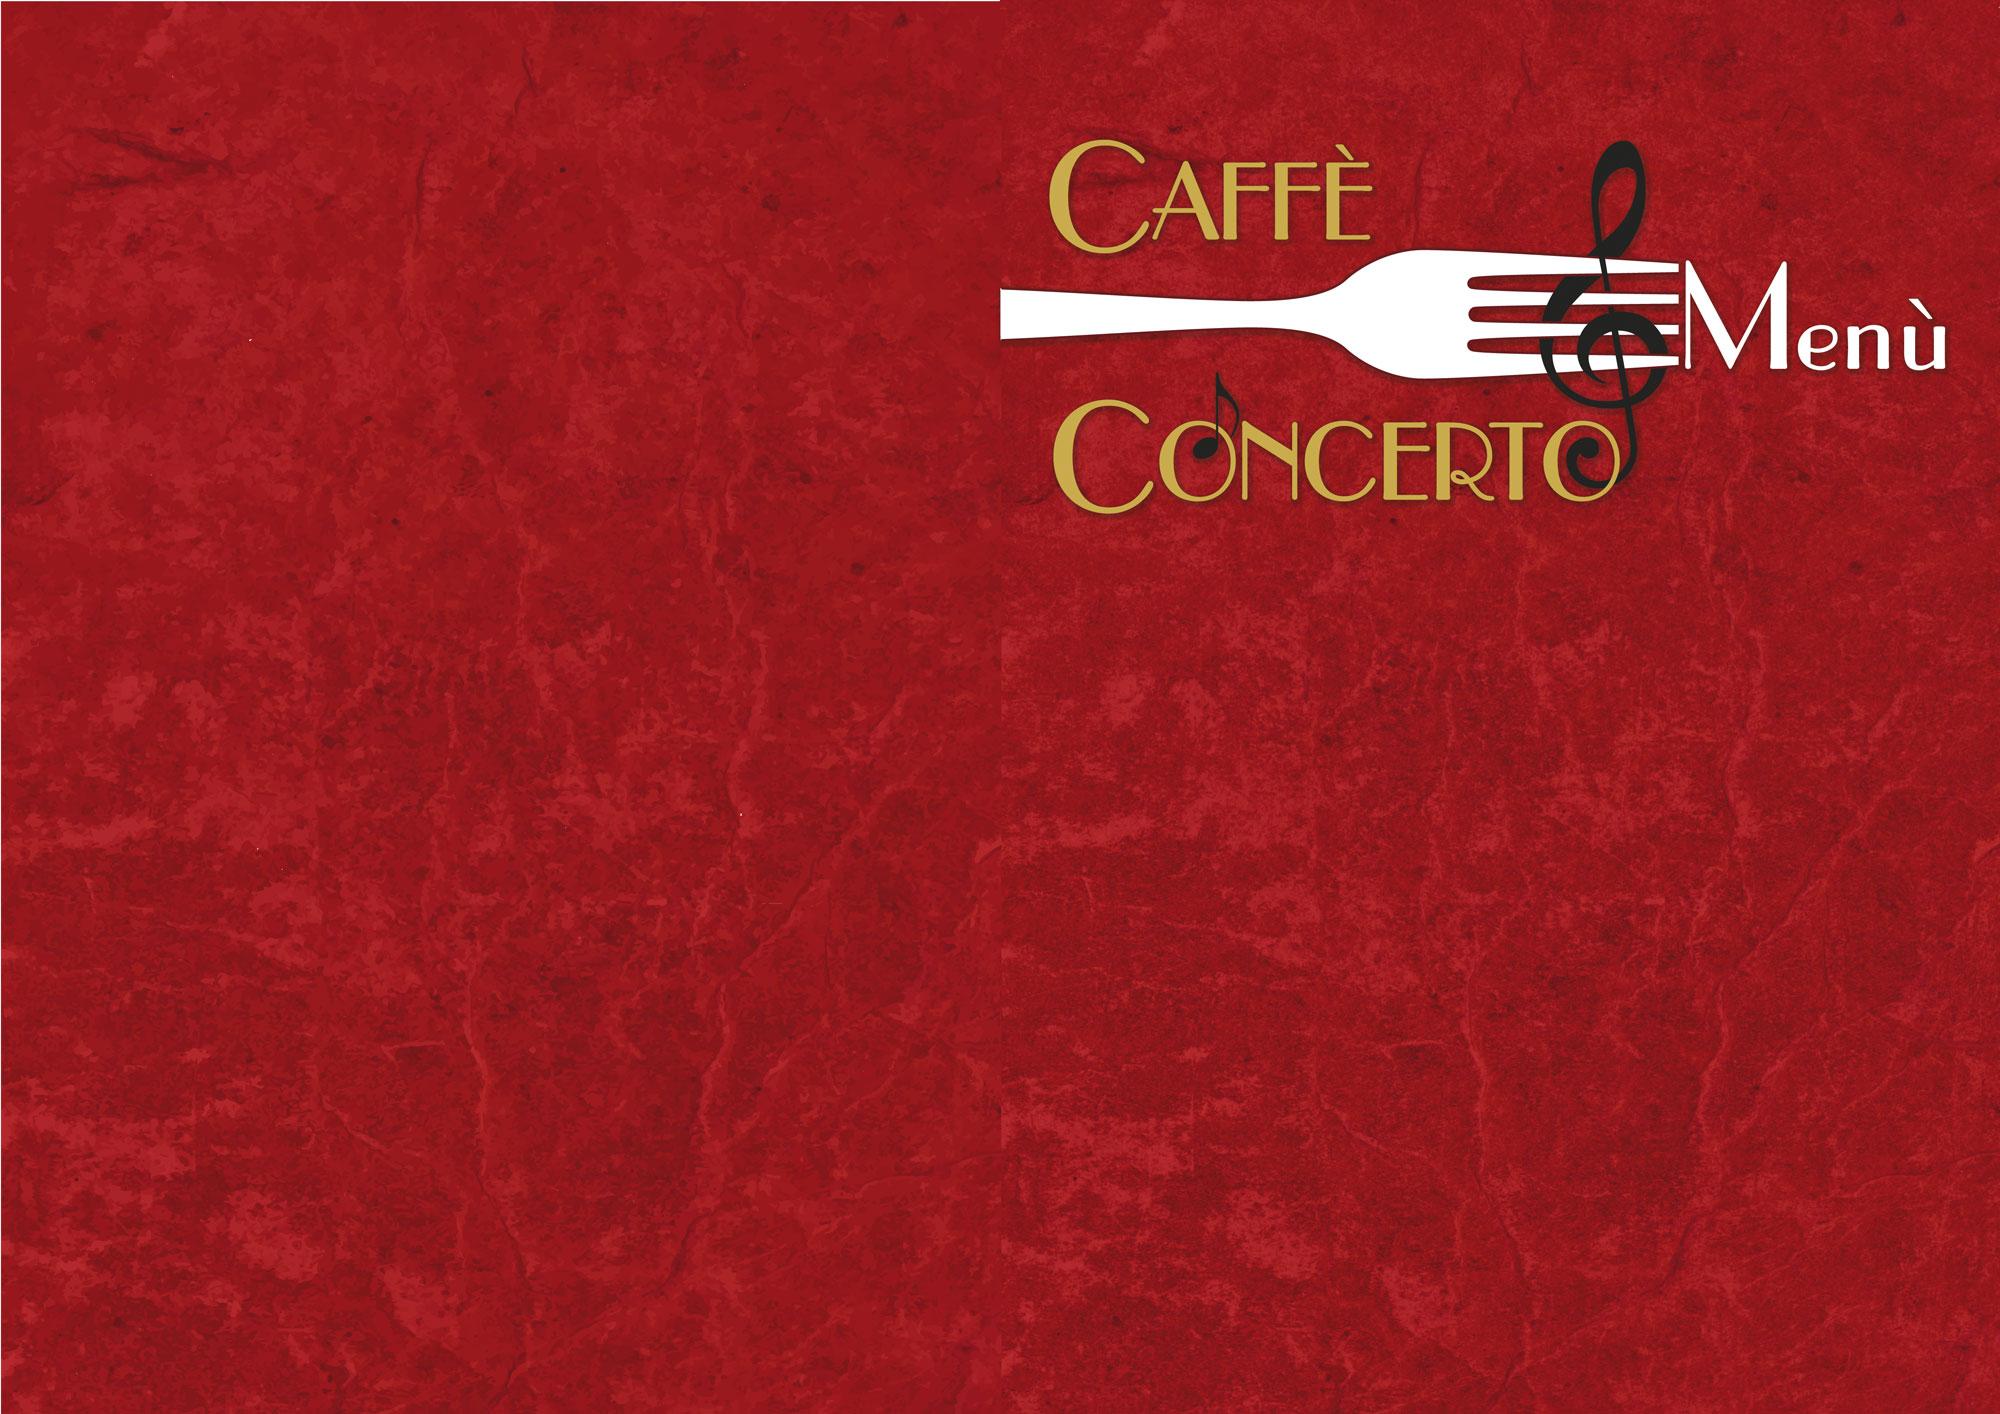 Menù CAffè Concertobase2 copia